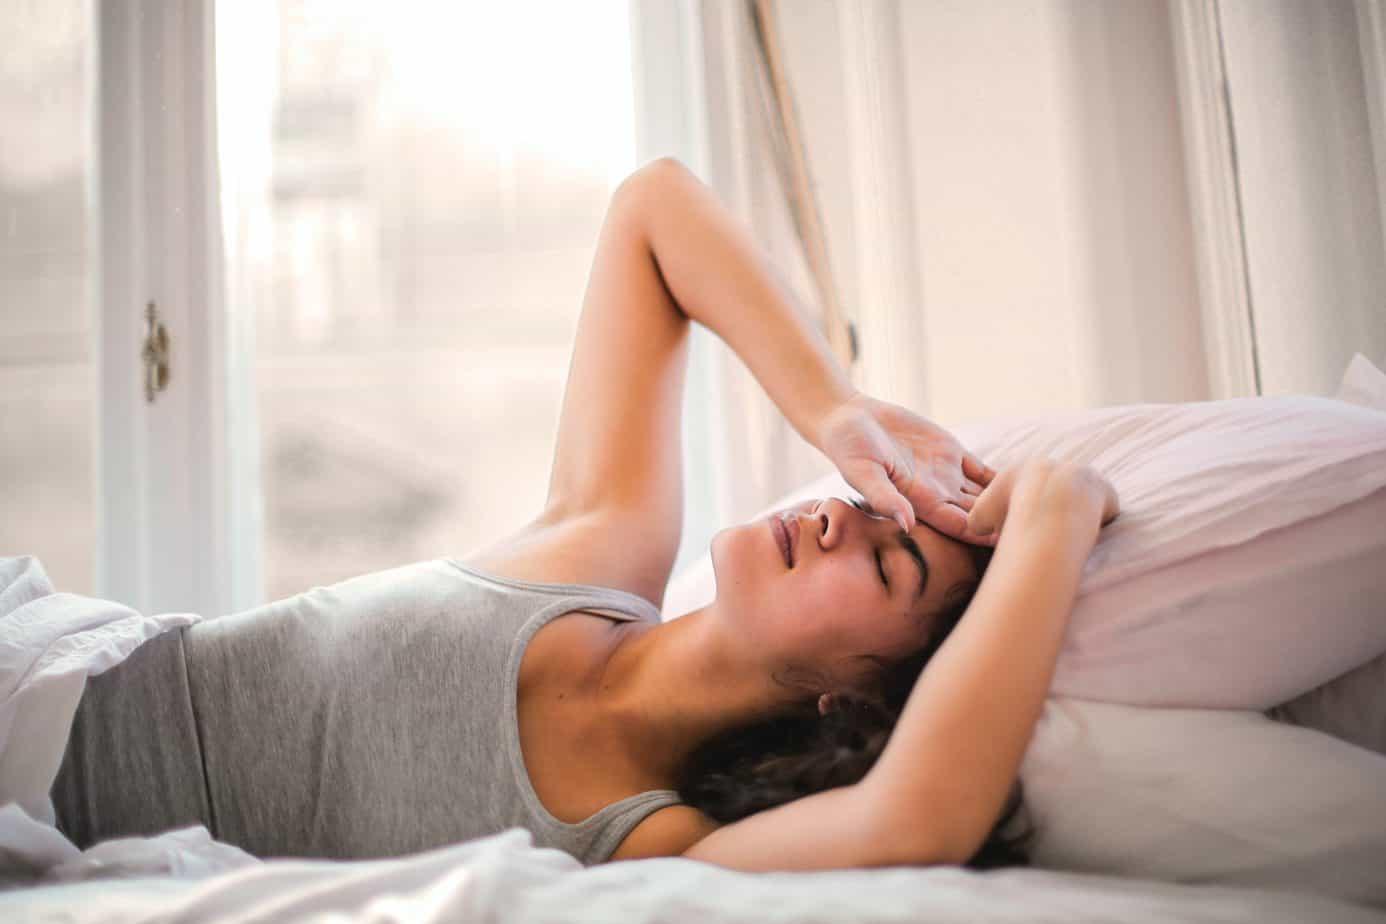 sommeil diurne cephalee remede insomnie